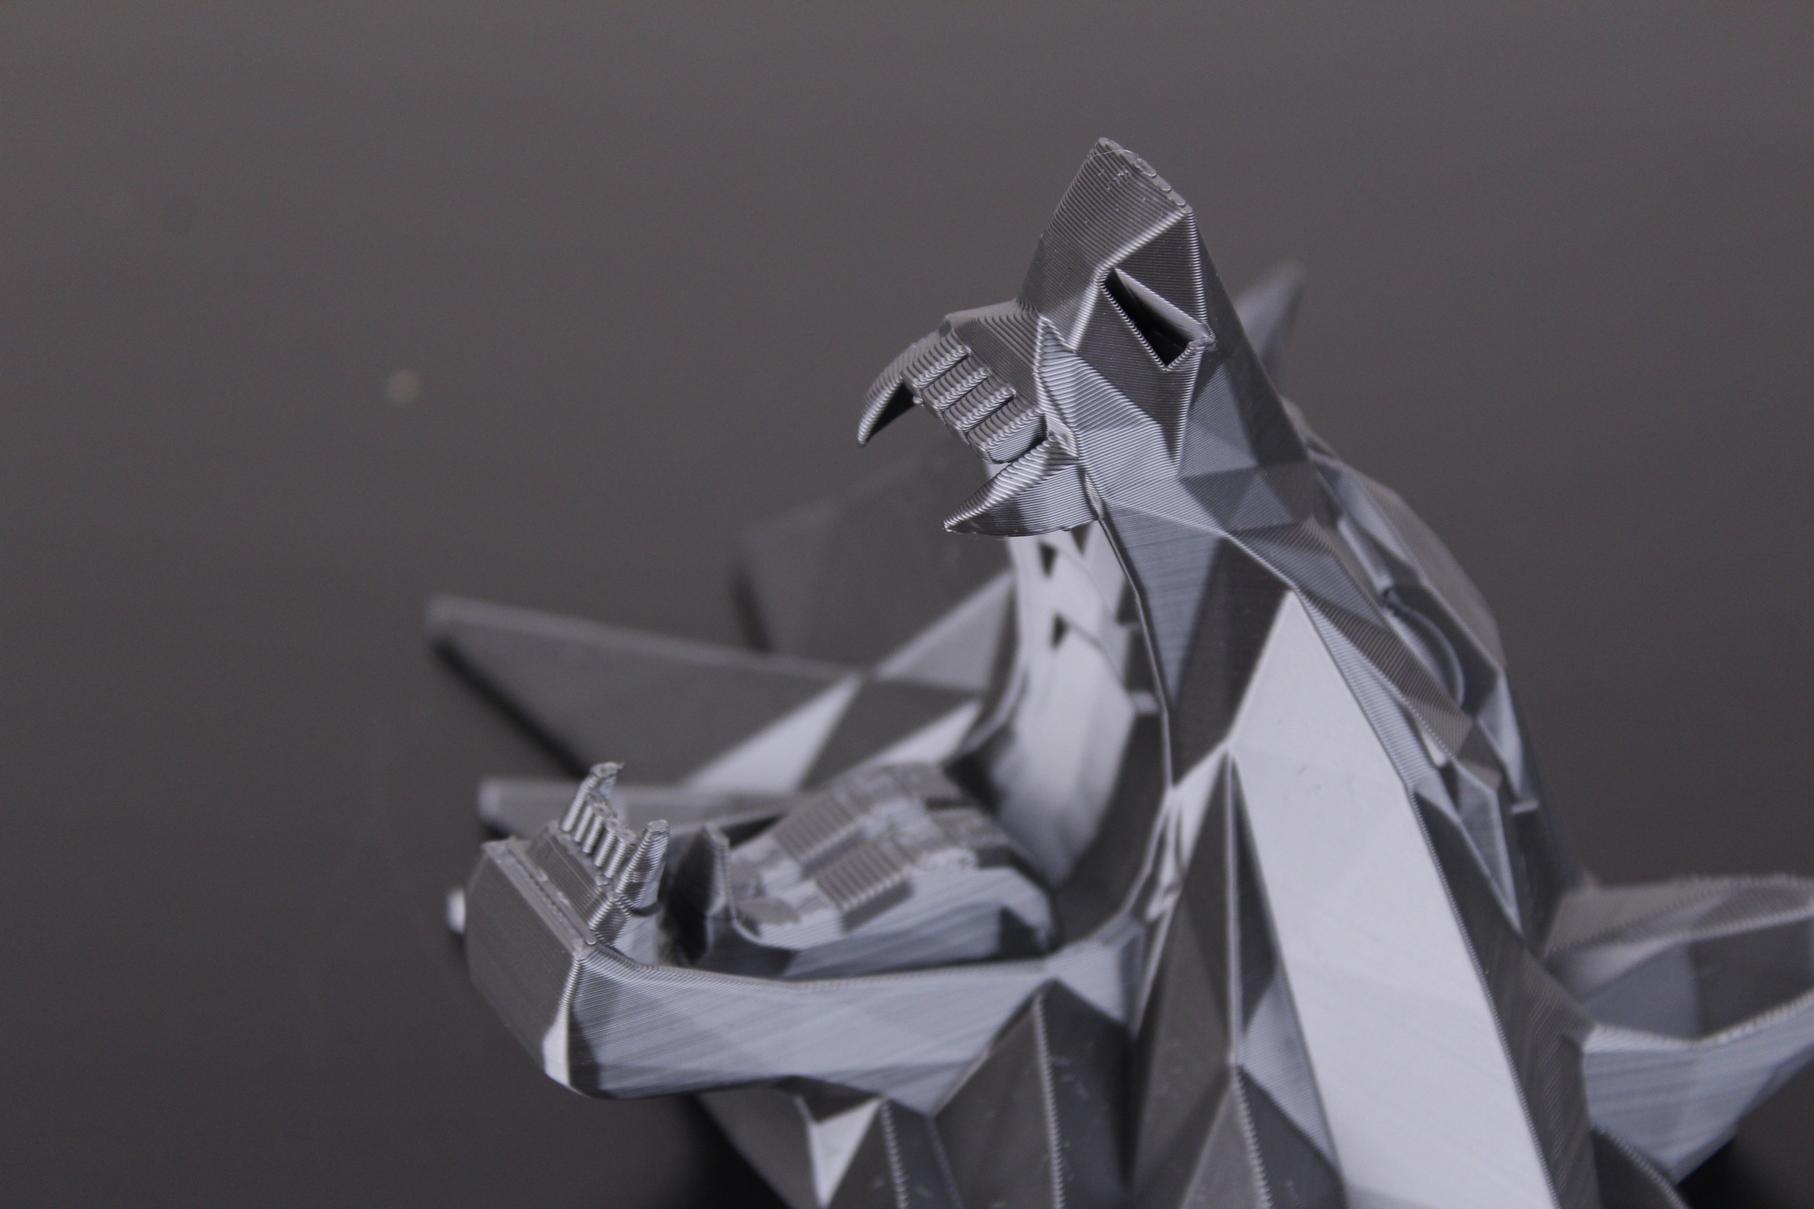 Witcher Wolf Medallion 2   Trianglelab Spiral Tower Hotend Review